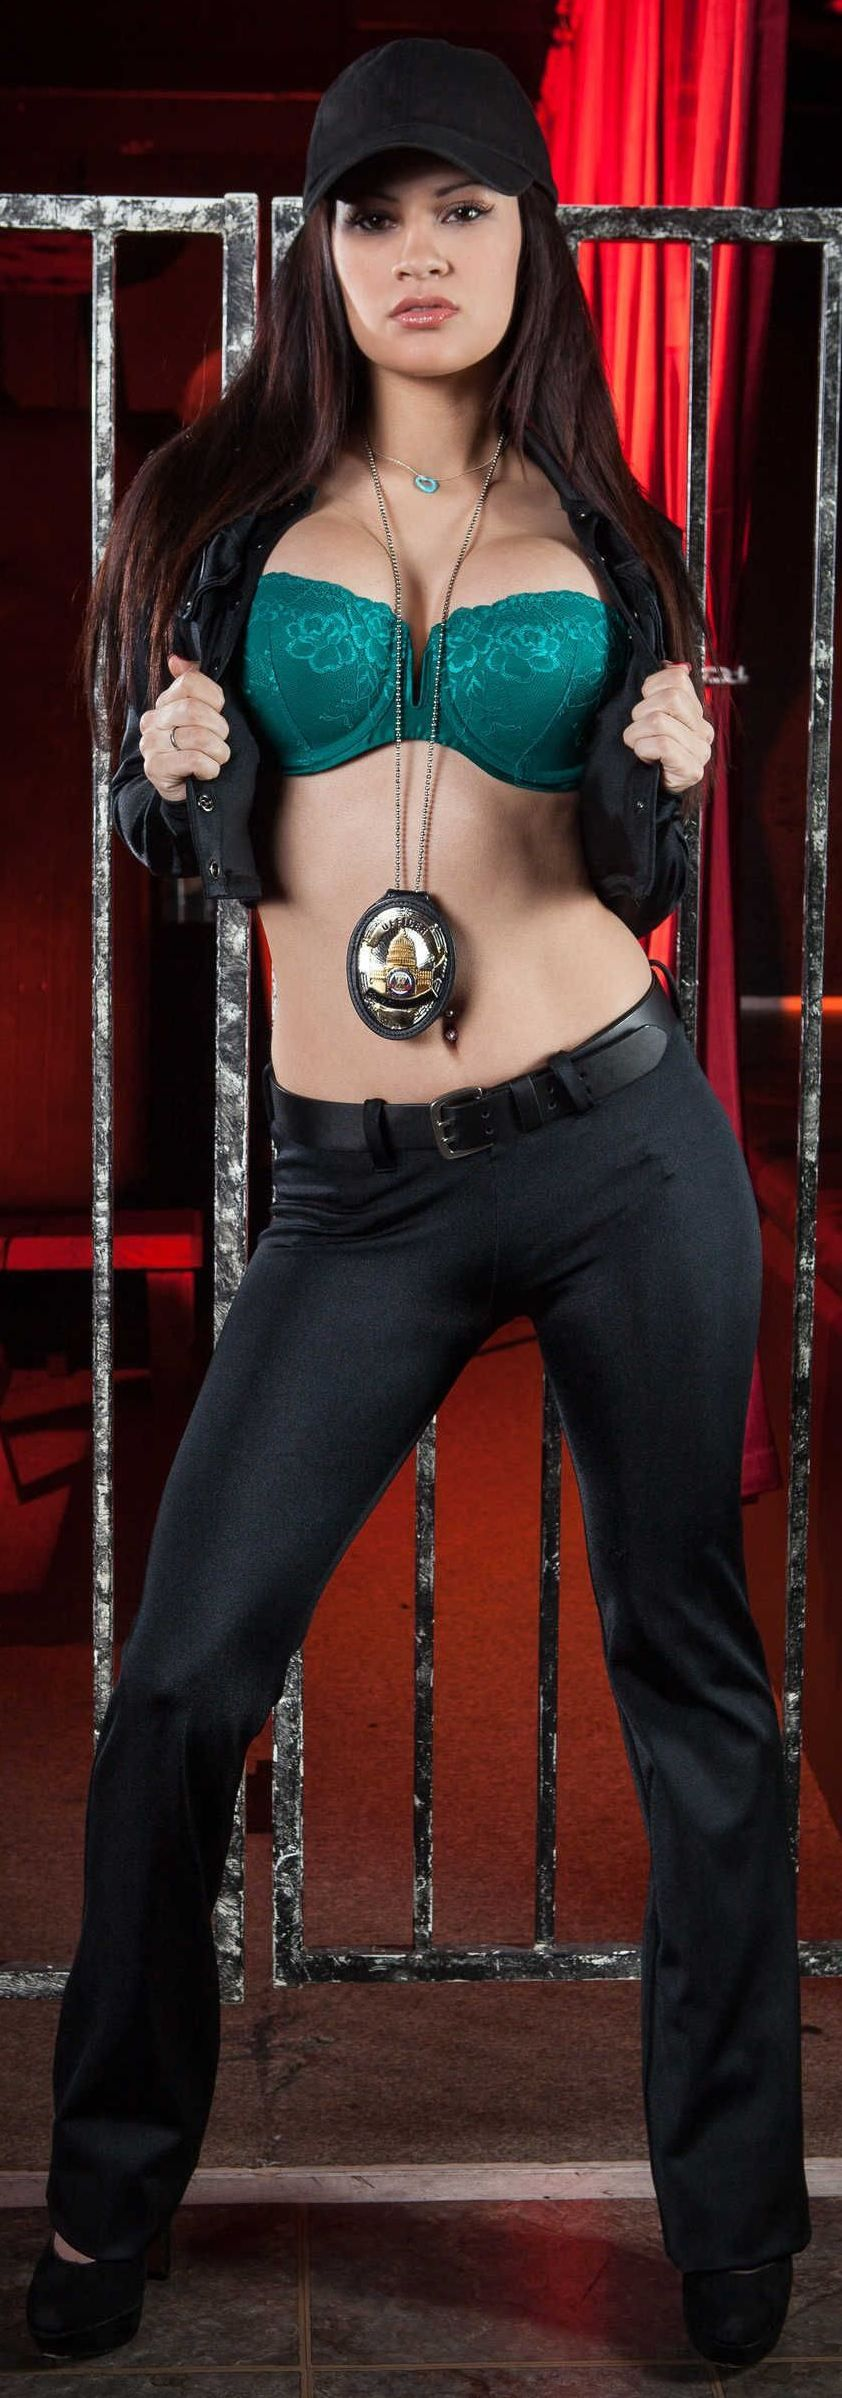 Cop and pornstar